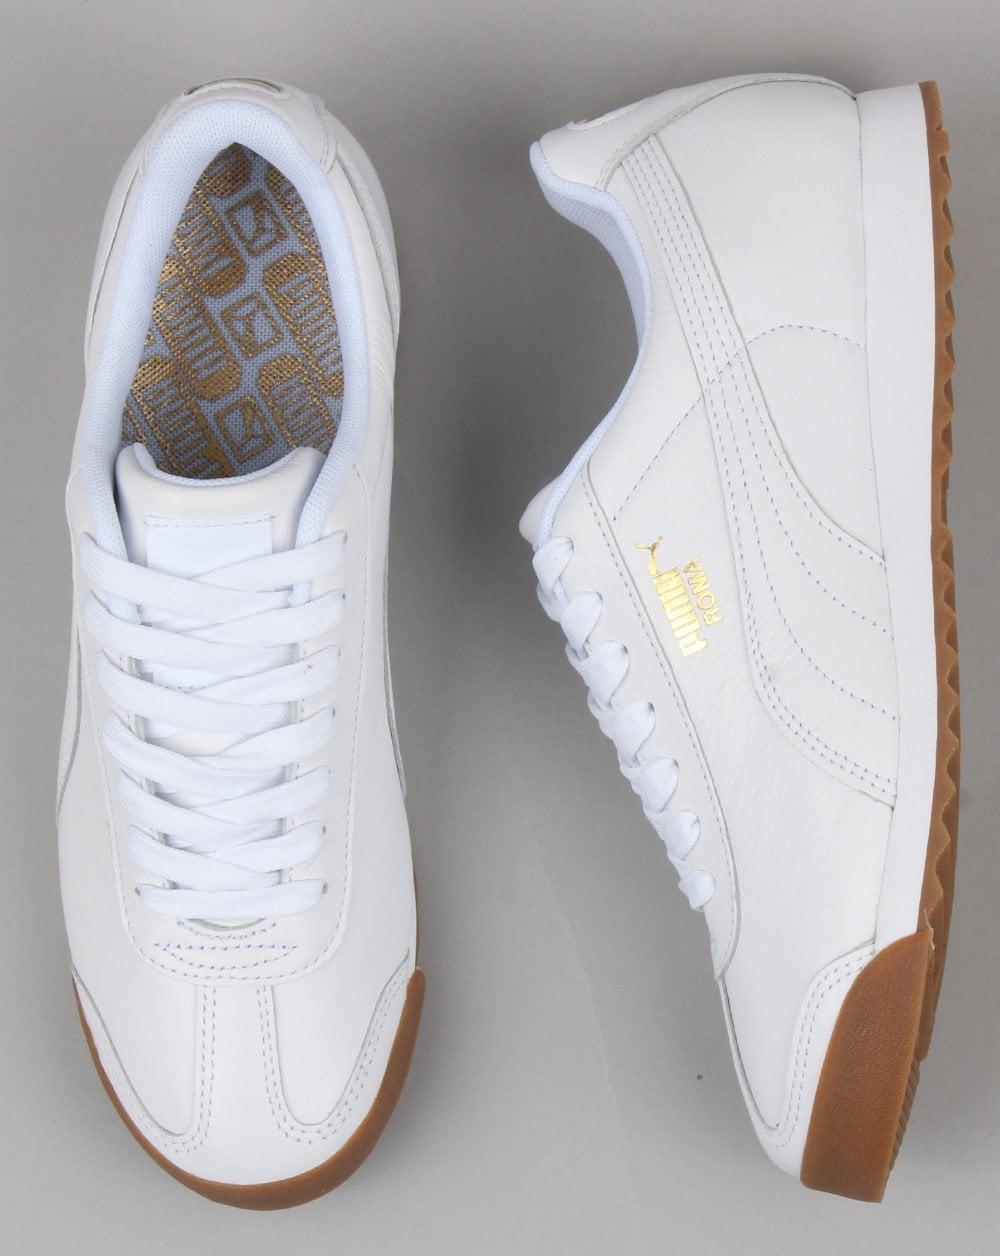 2d652dd5b Puma Roma Classic Gum Trainer White, leather | 80s casual classics